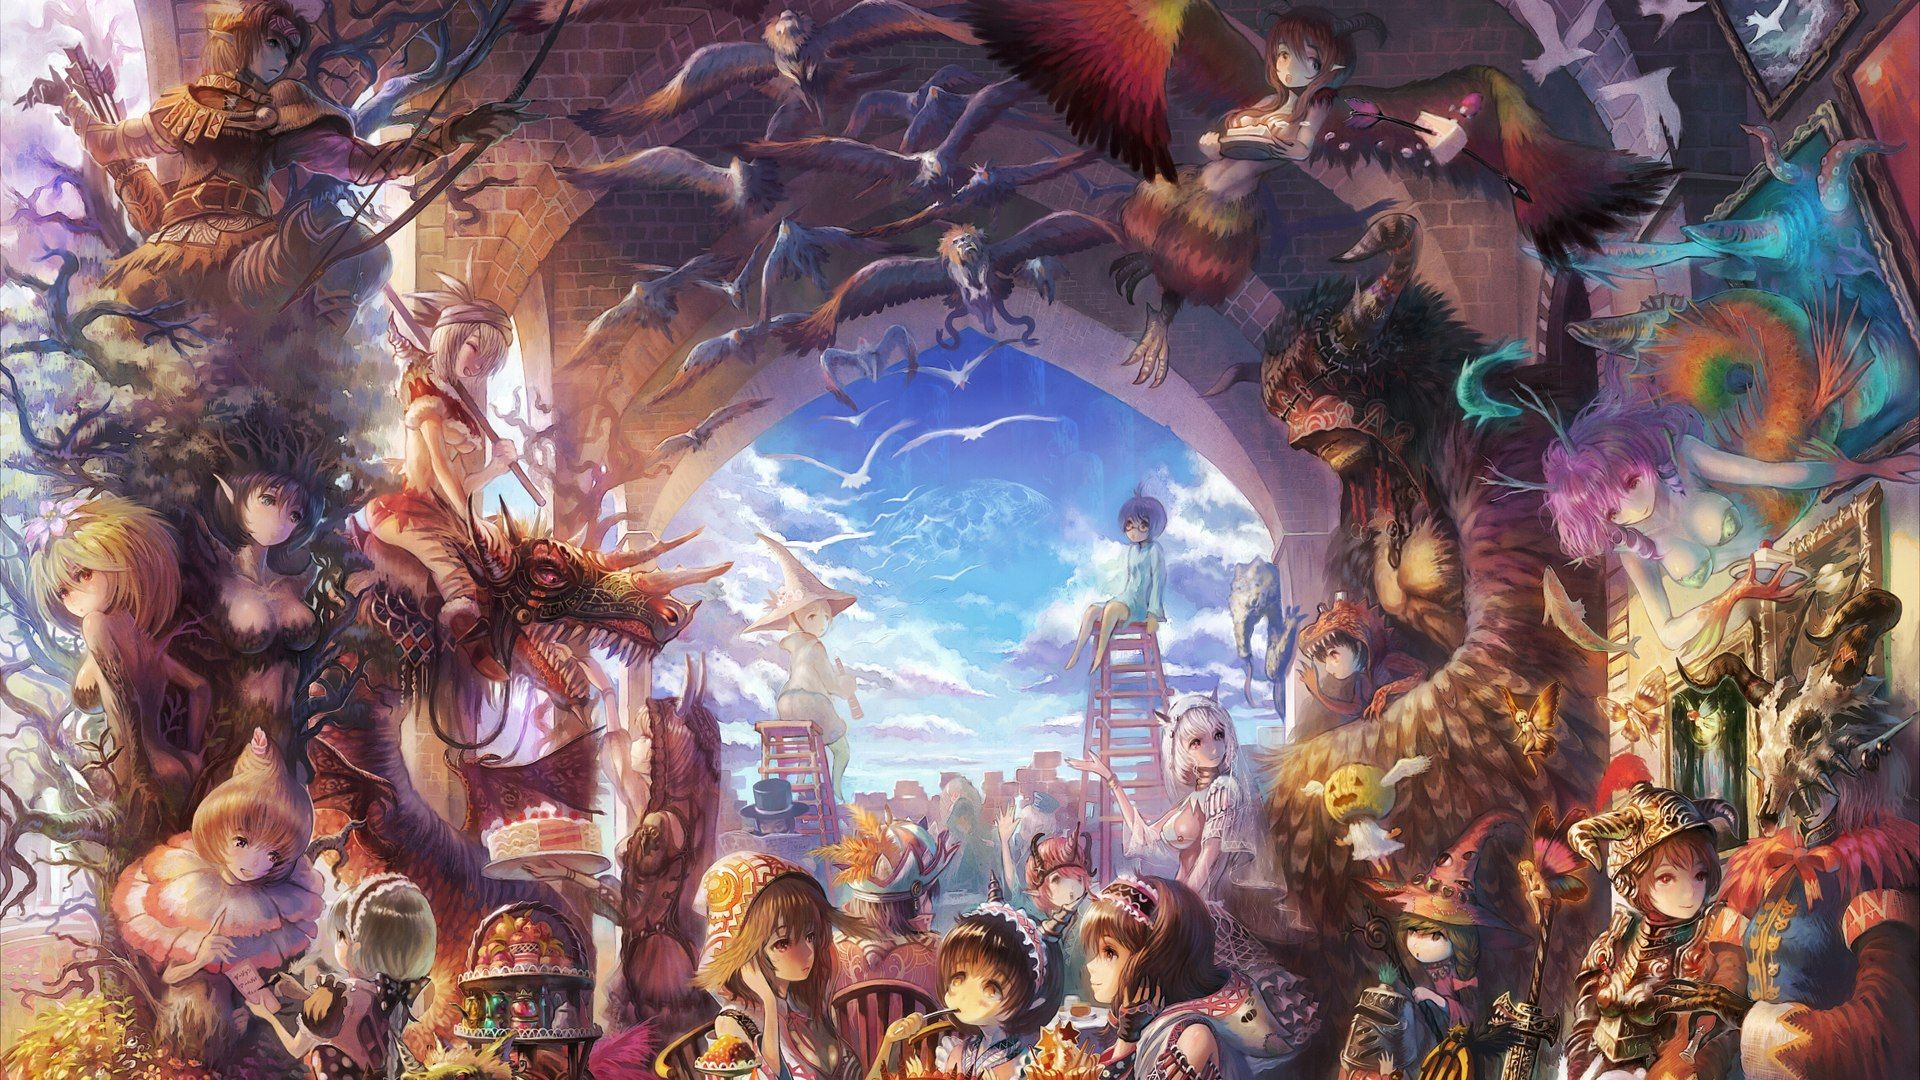 Anime Art Desktop Wallpapers Top Free Anime Art Desktop